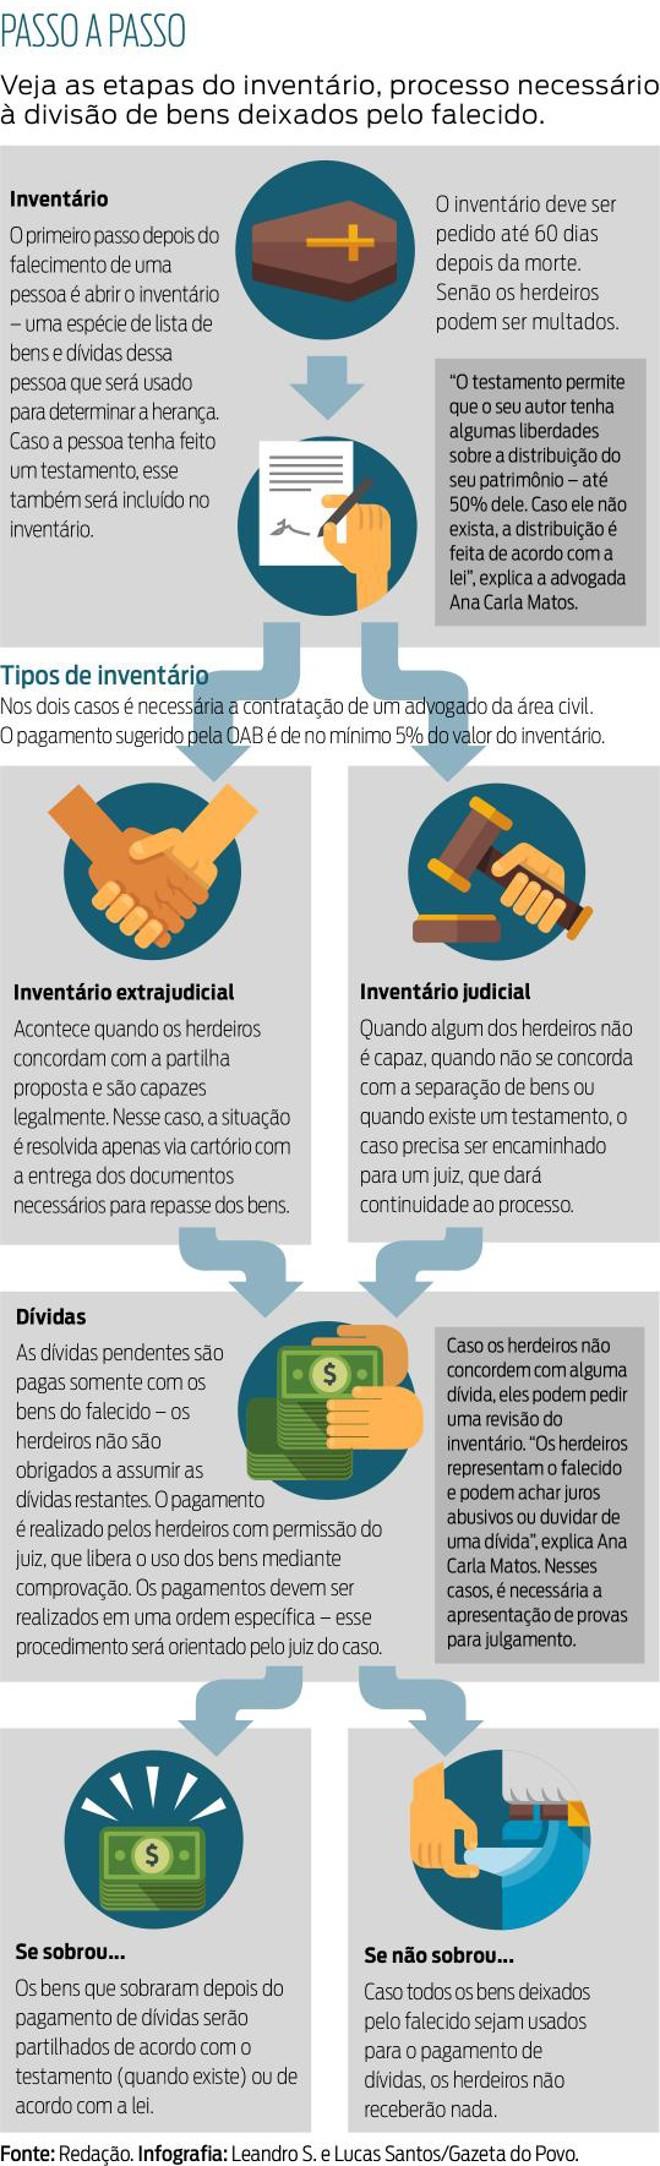 advogado de inventario brasilia